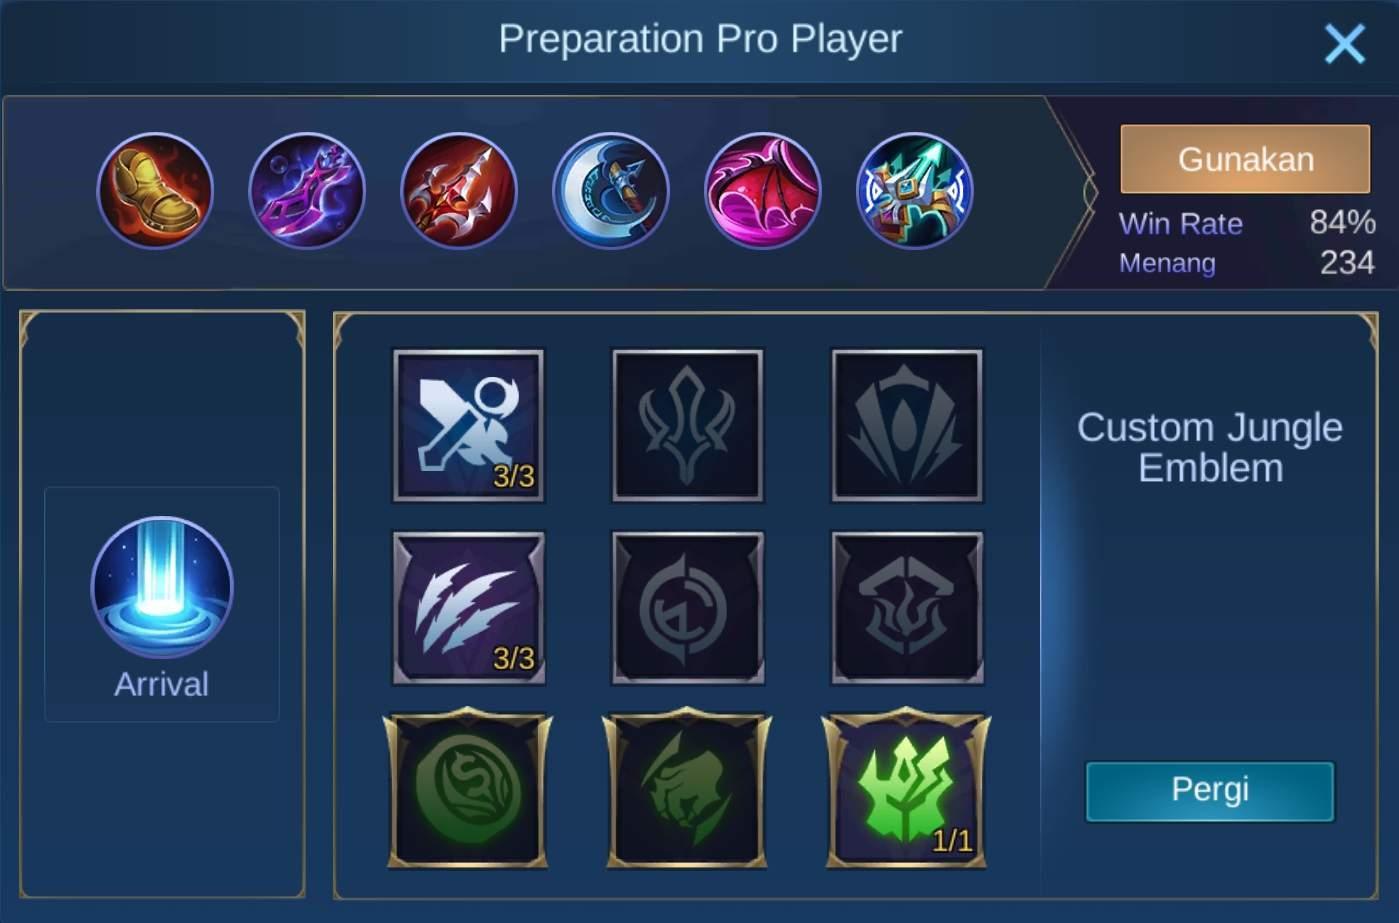 build item moskov mobile legends (ML)